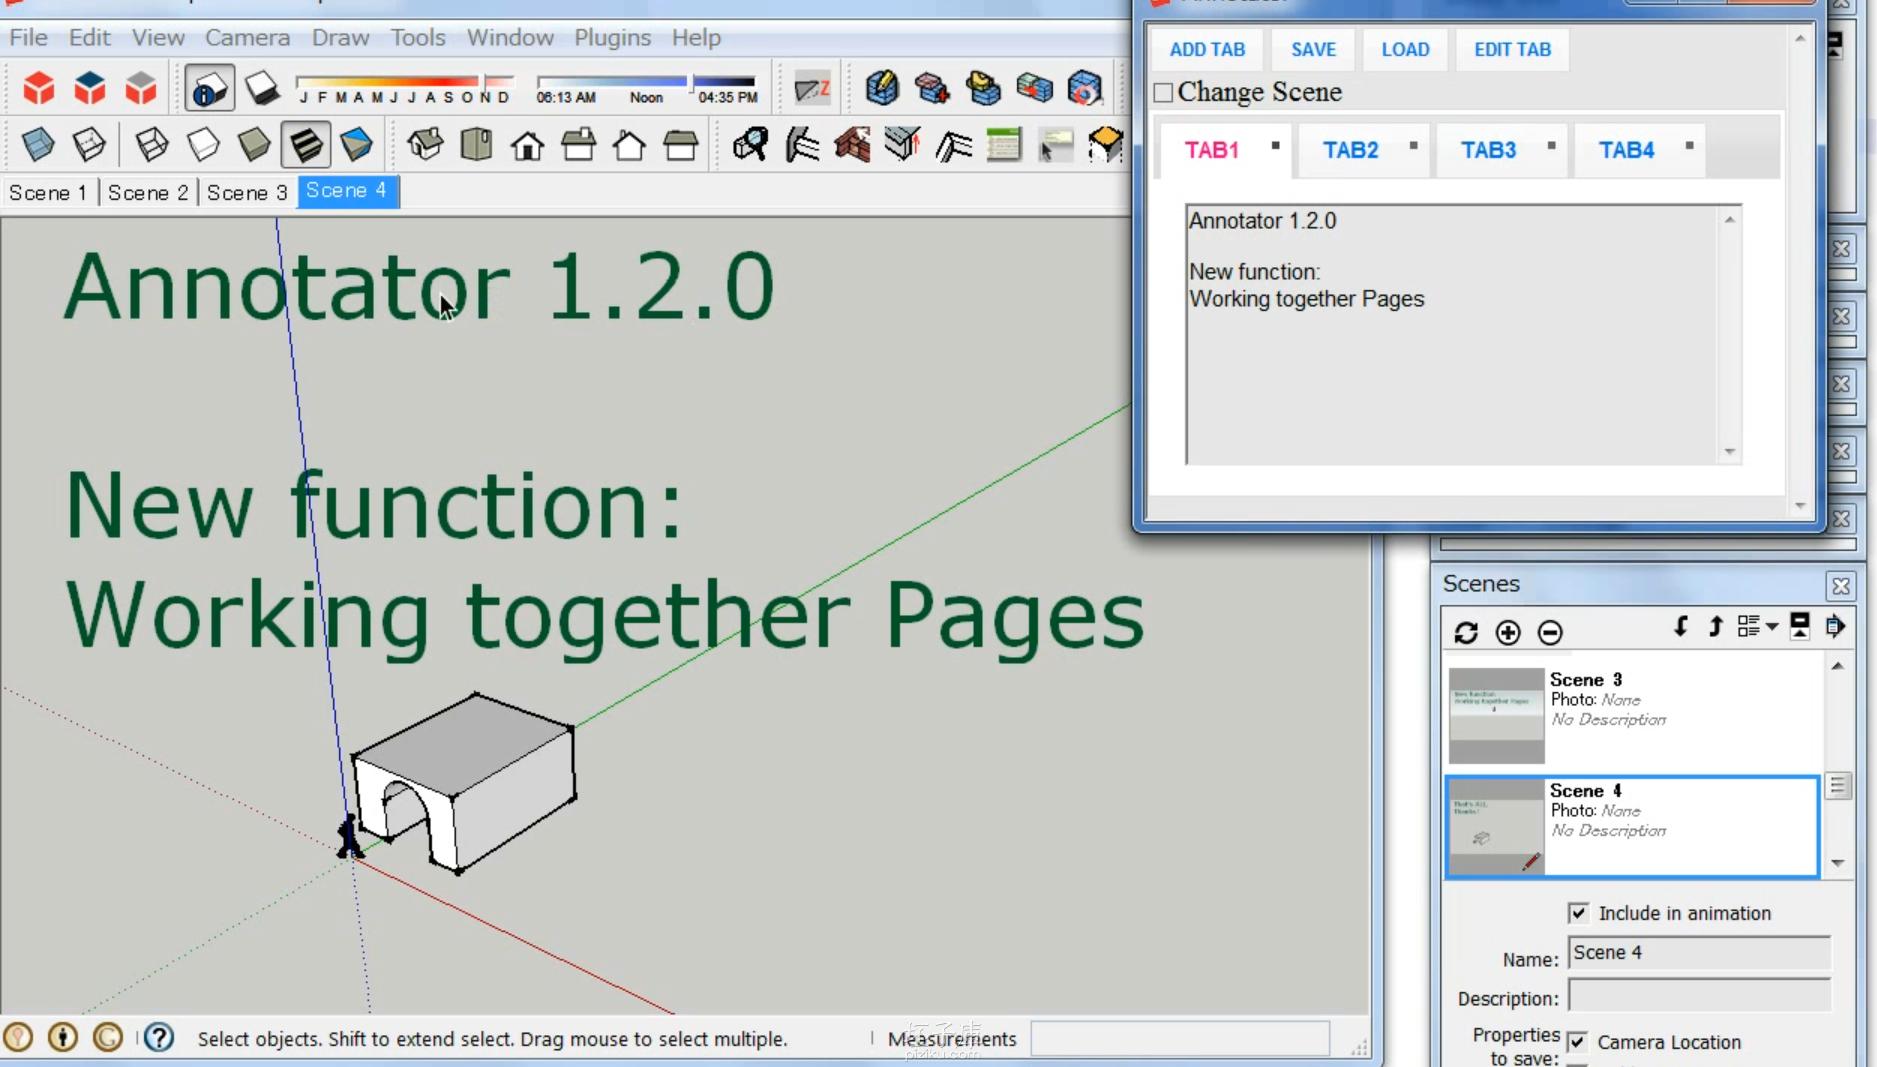 1001bit tools sketchup 8 for Google sketchup converter